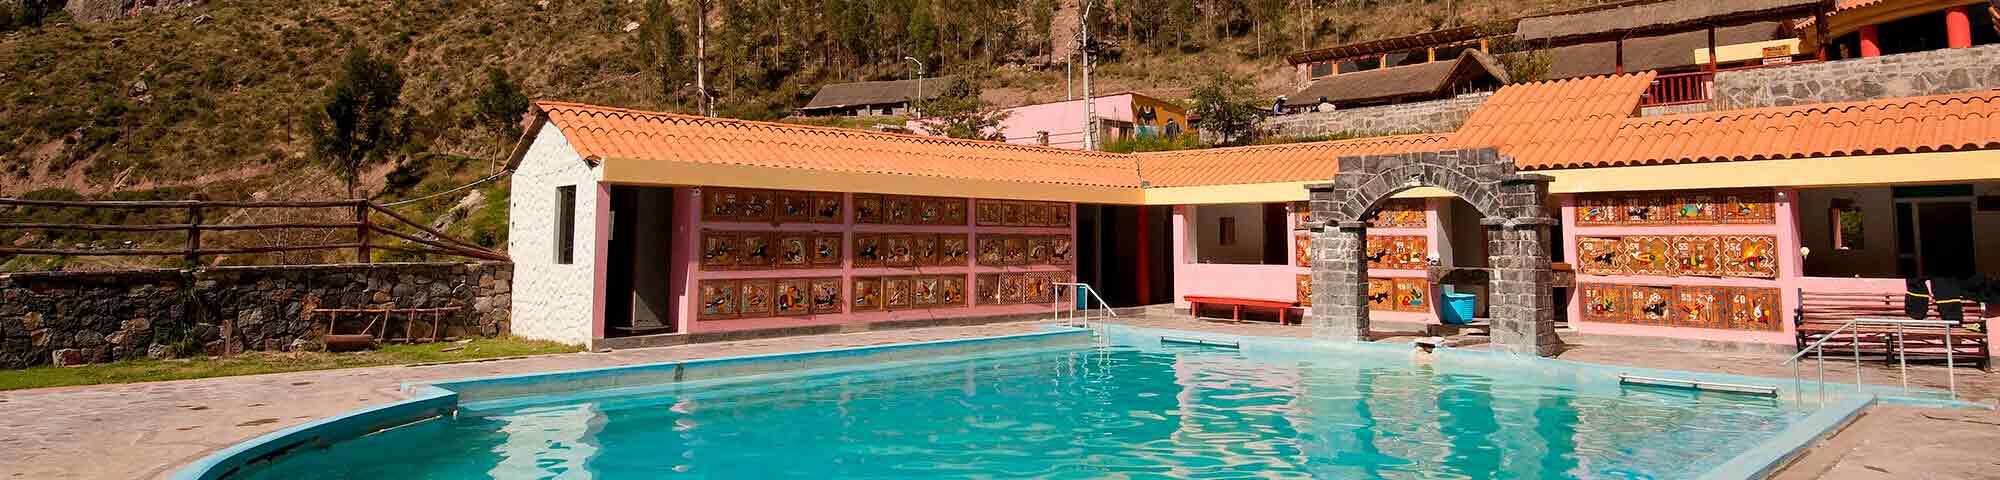 Baños termales La Calera